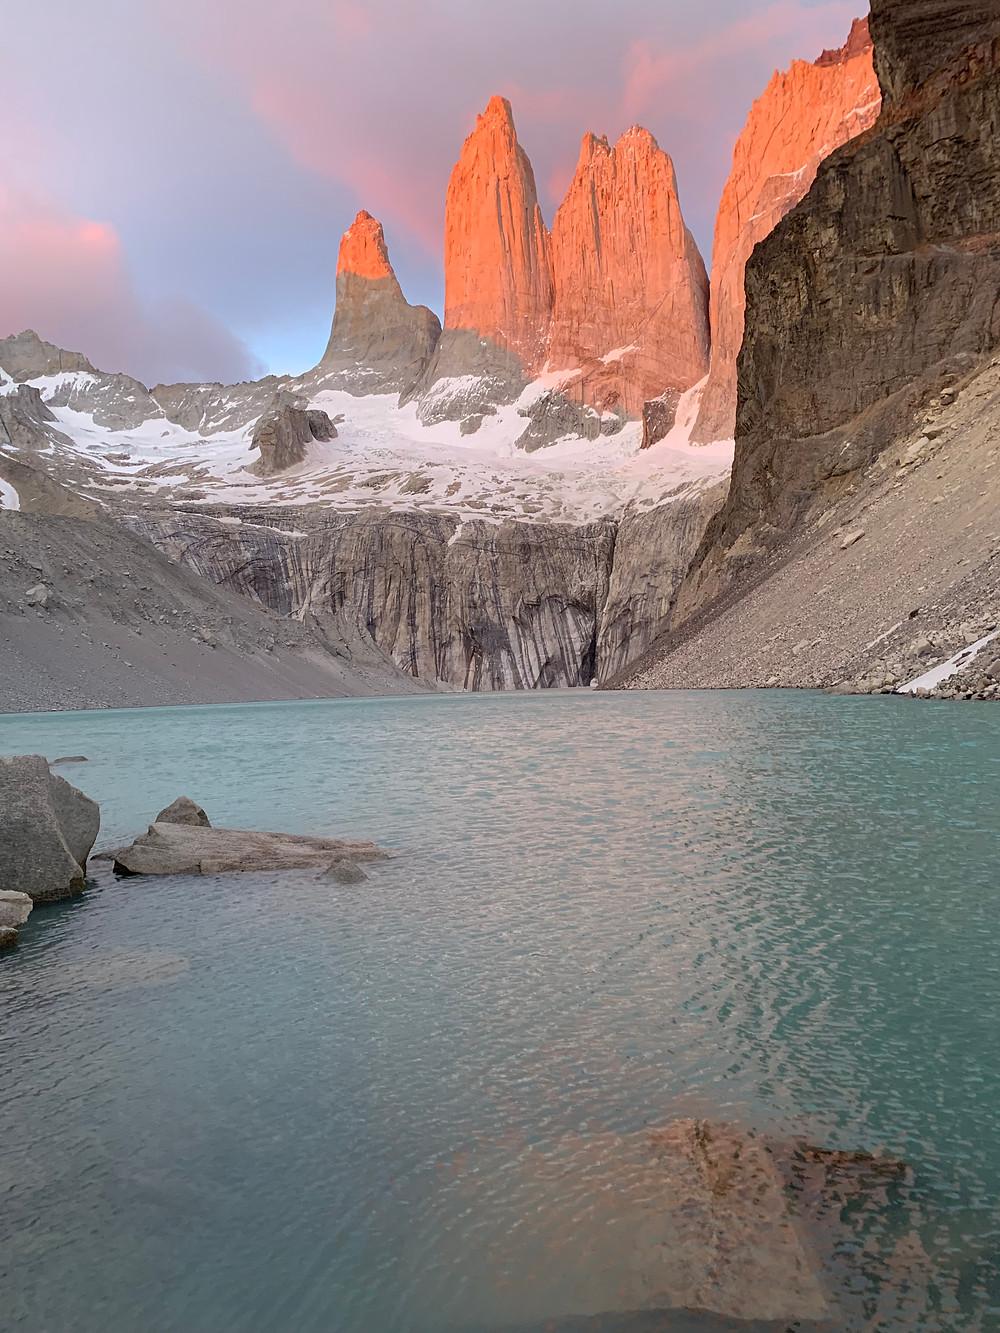 Sunrise at Las Torres on the W-Trek